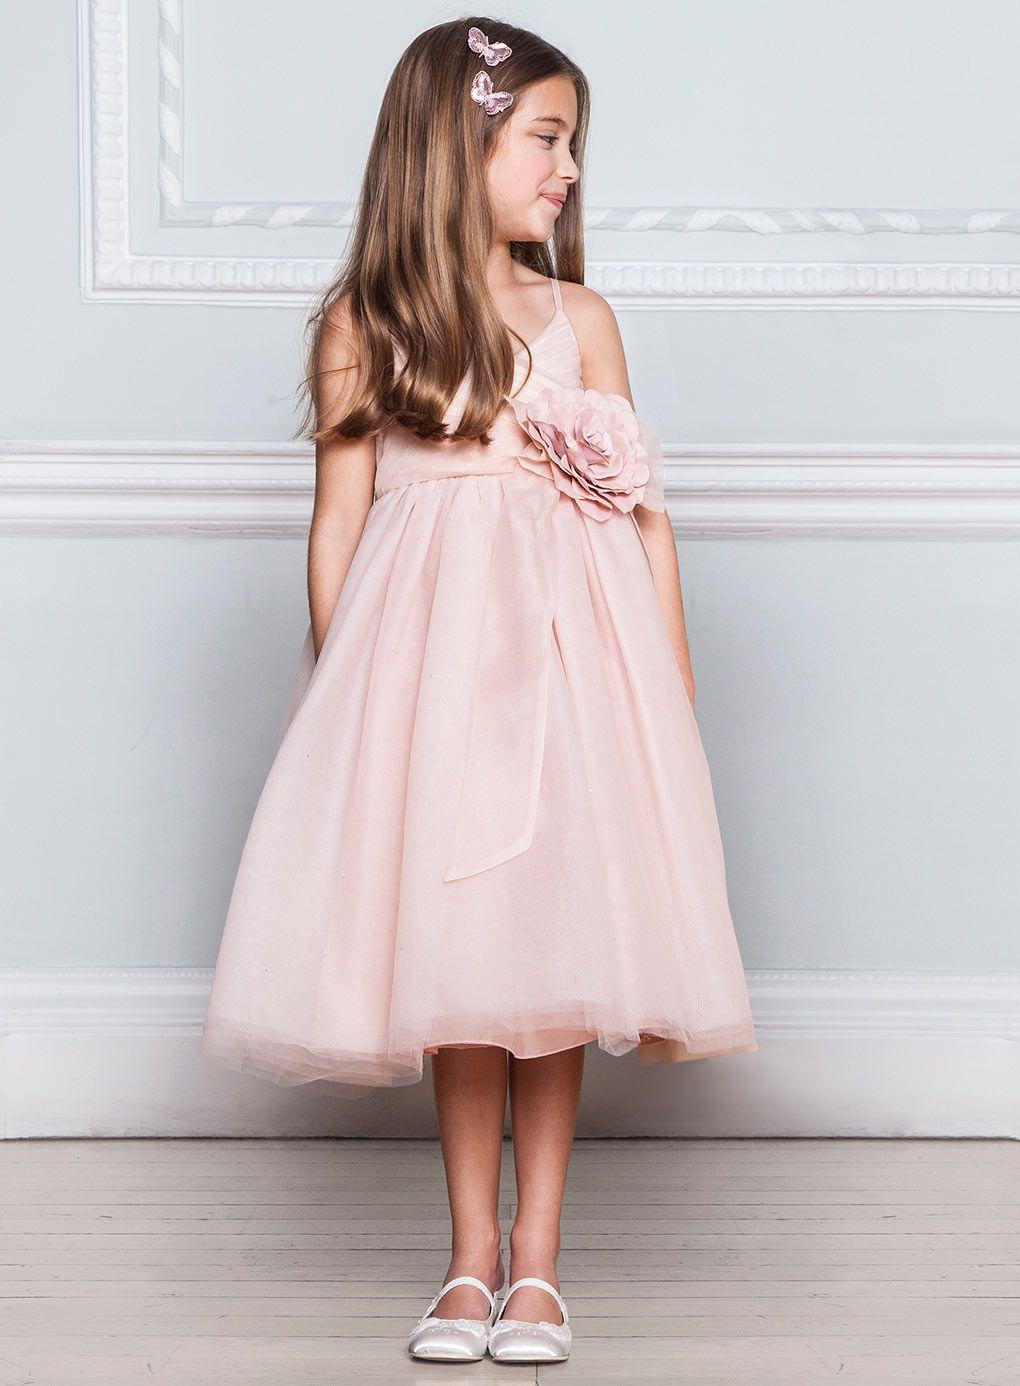 Lydia Blush Bridesmaid Dress - child dresses - young ...